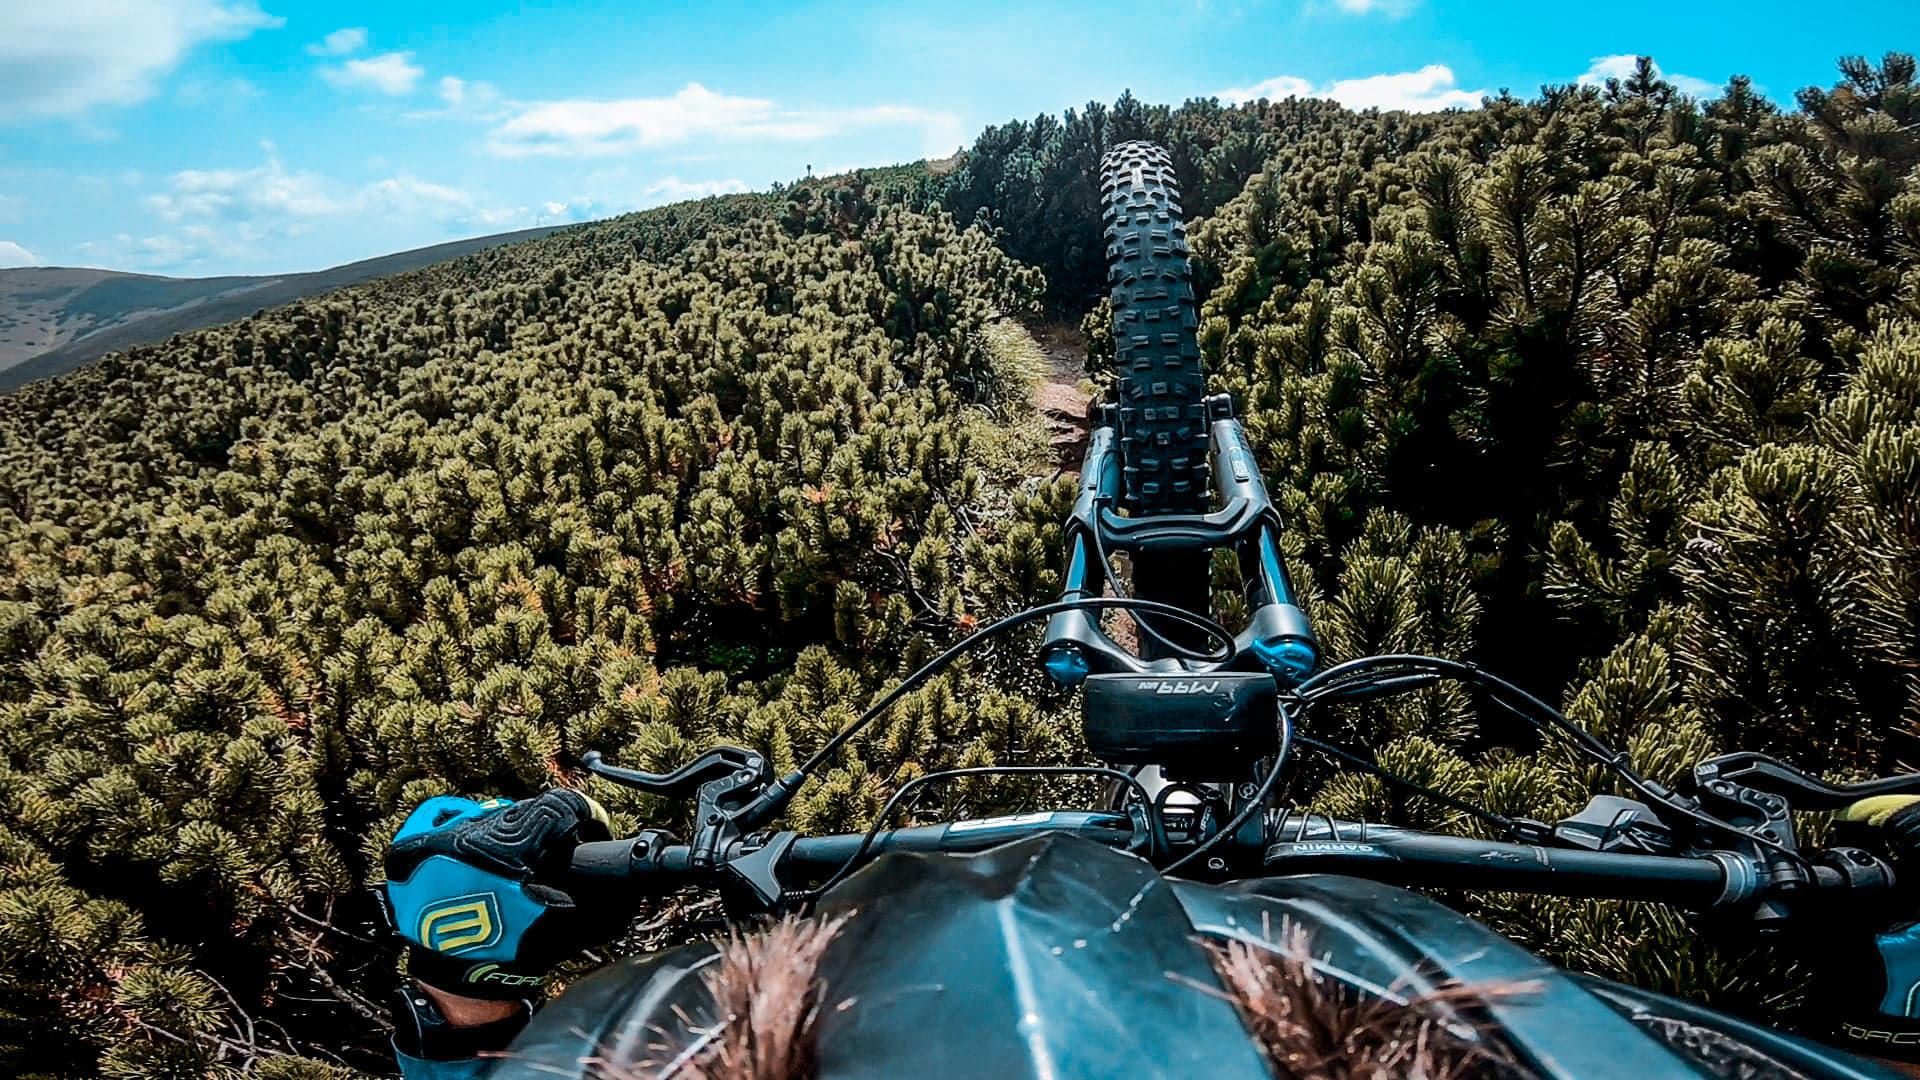 Evident ca am facut si putin push bike, prin jnepenii de la Batrana